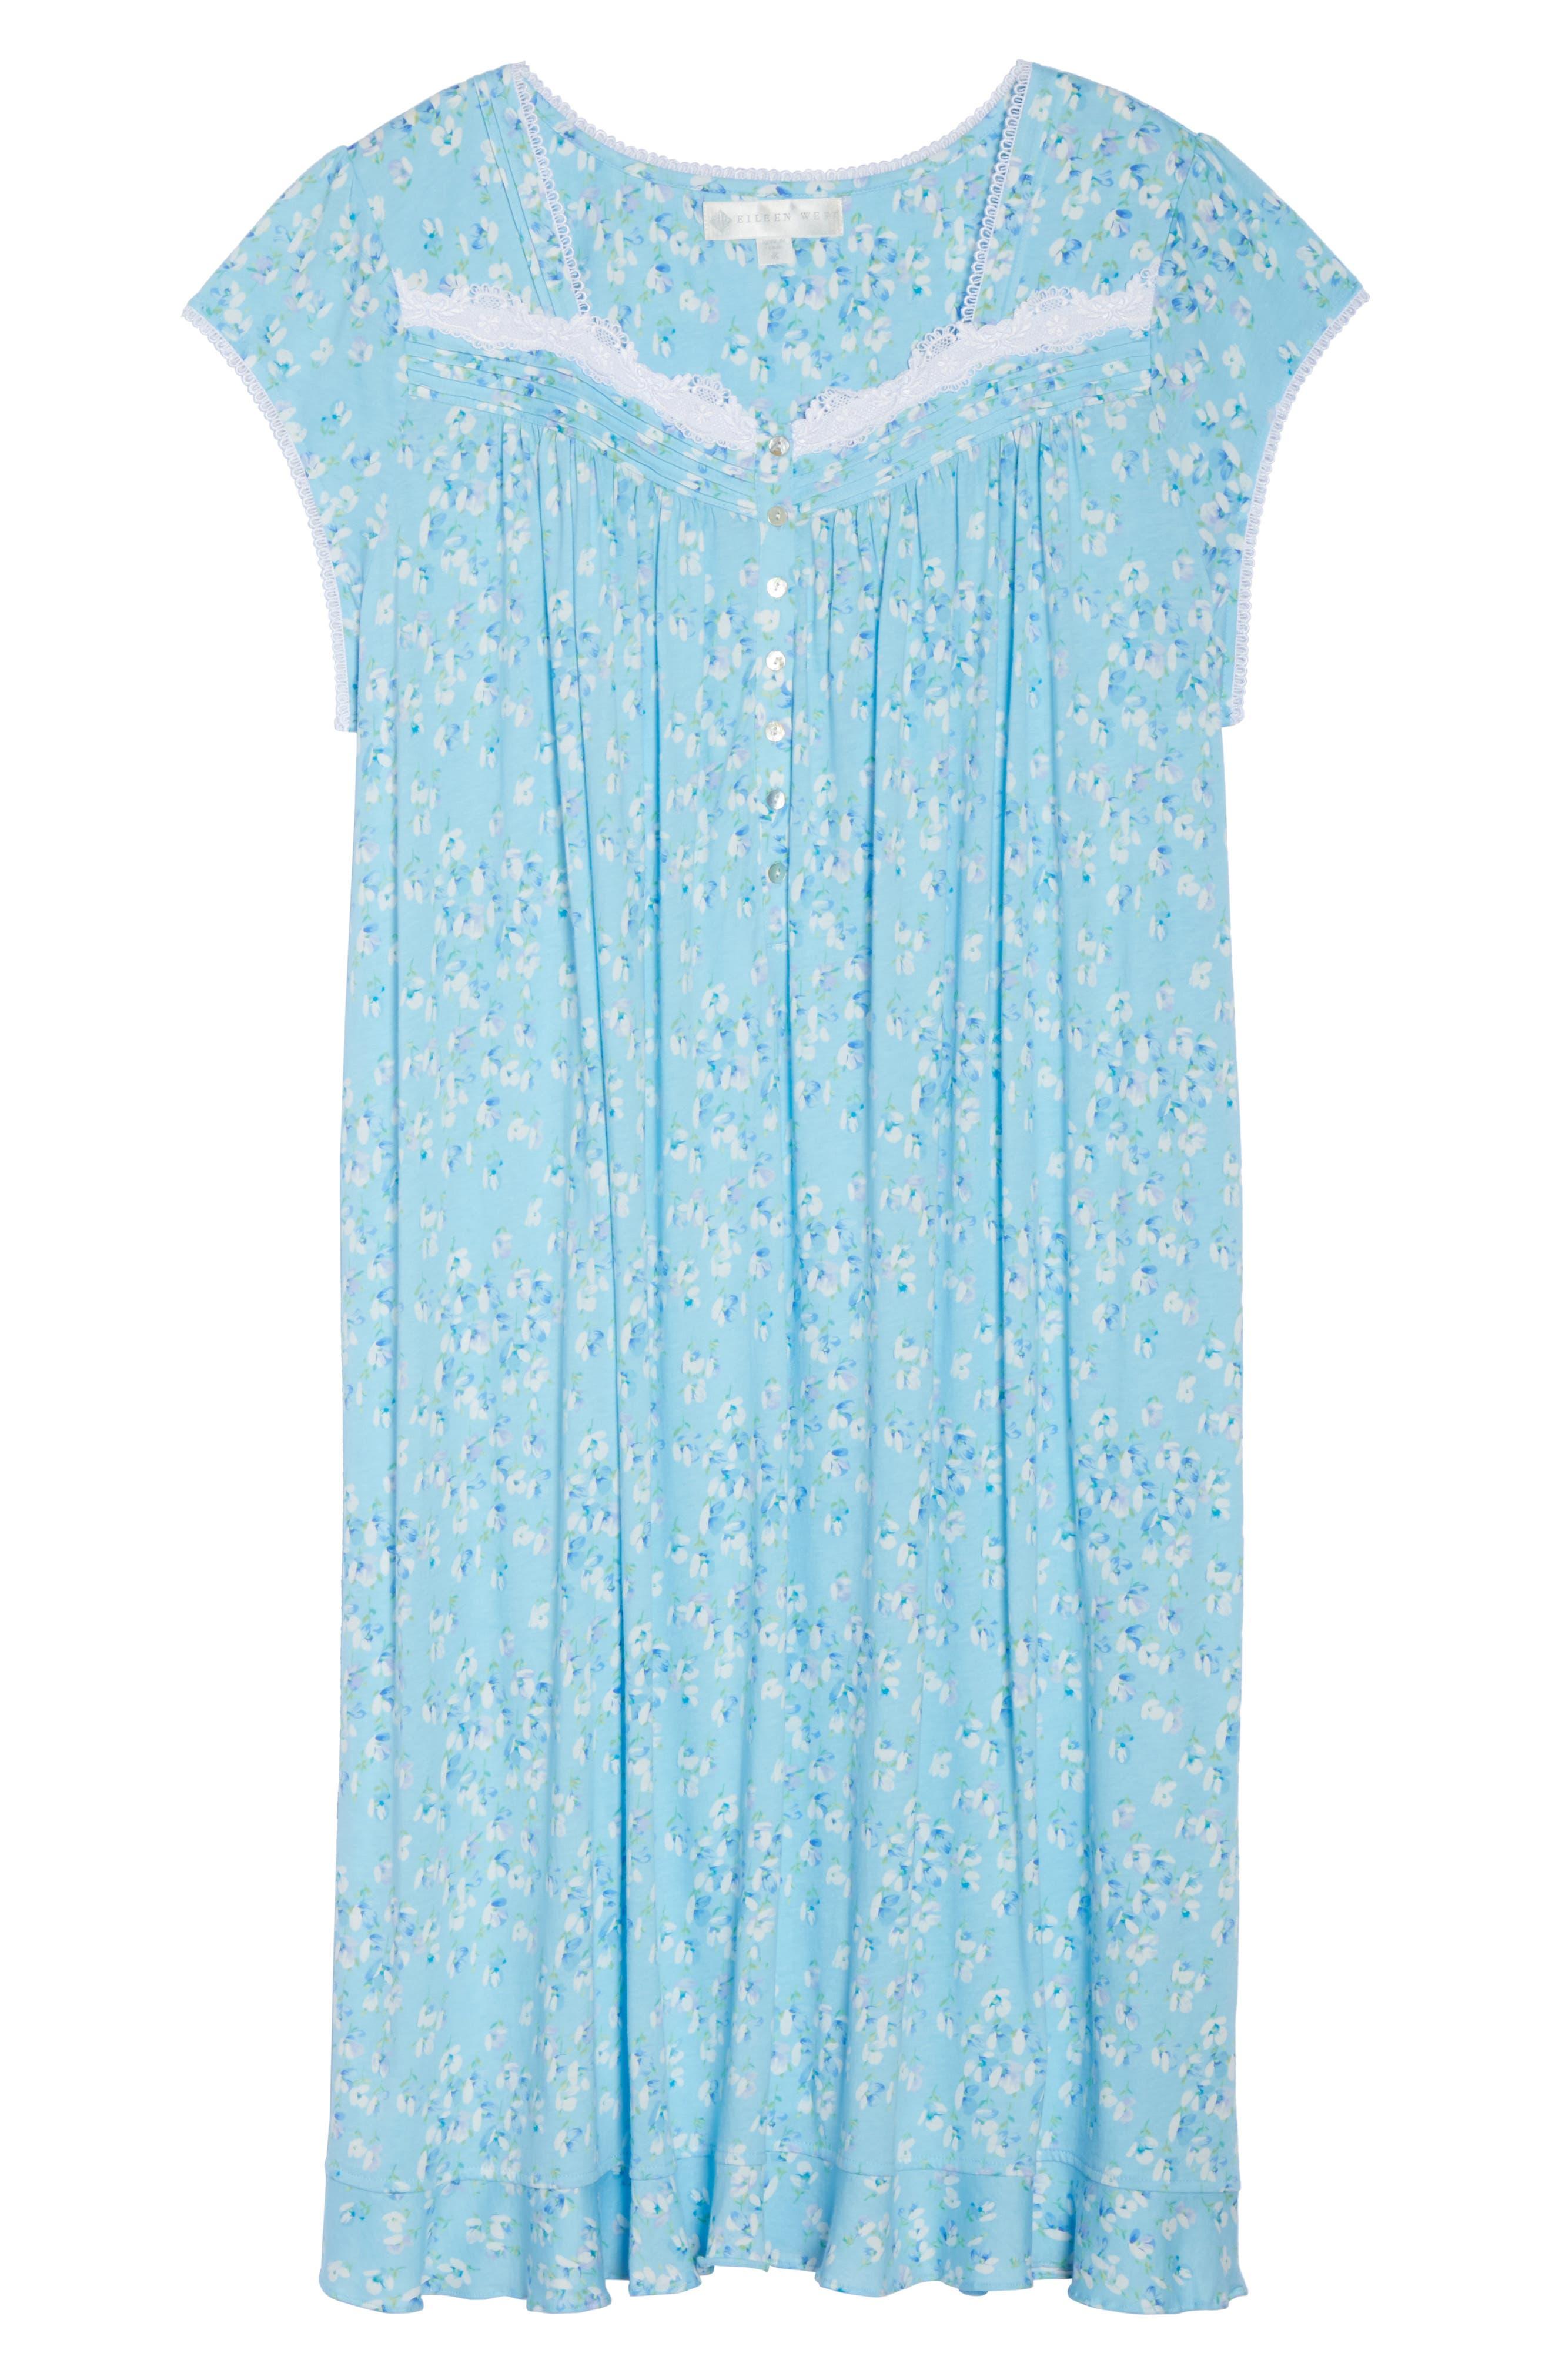 Waltz Nightgown,                             Alternate thumbnail 4, color,                             Light Sea Glass/ Multi Floral